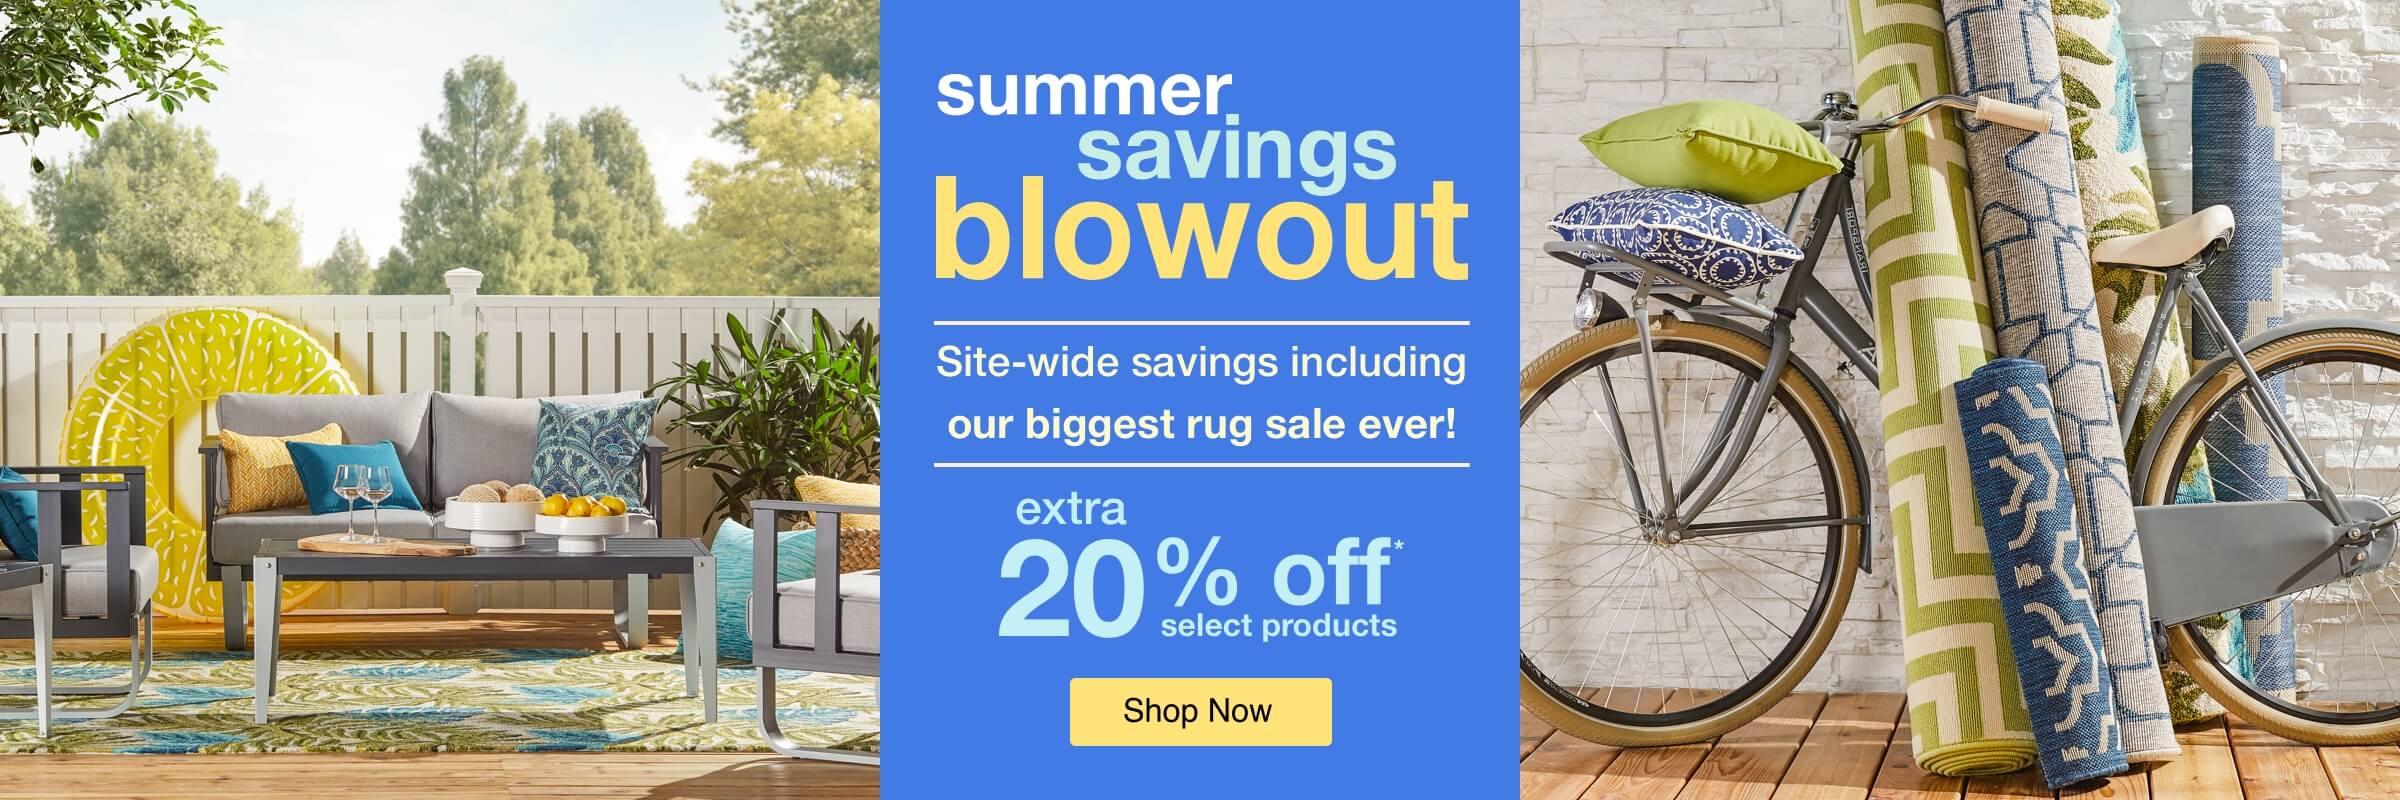 Summer Savings Blowout desktop